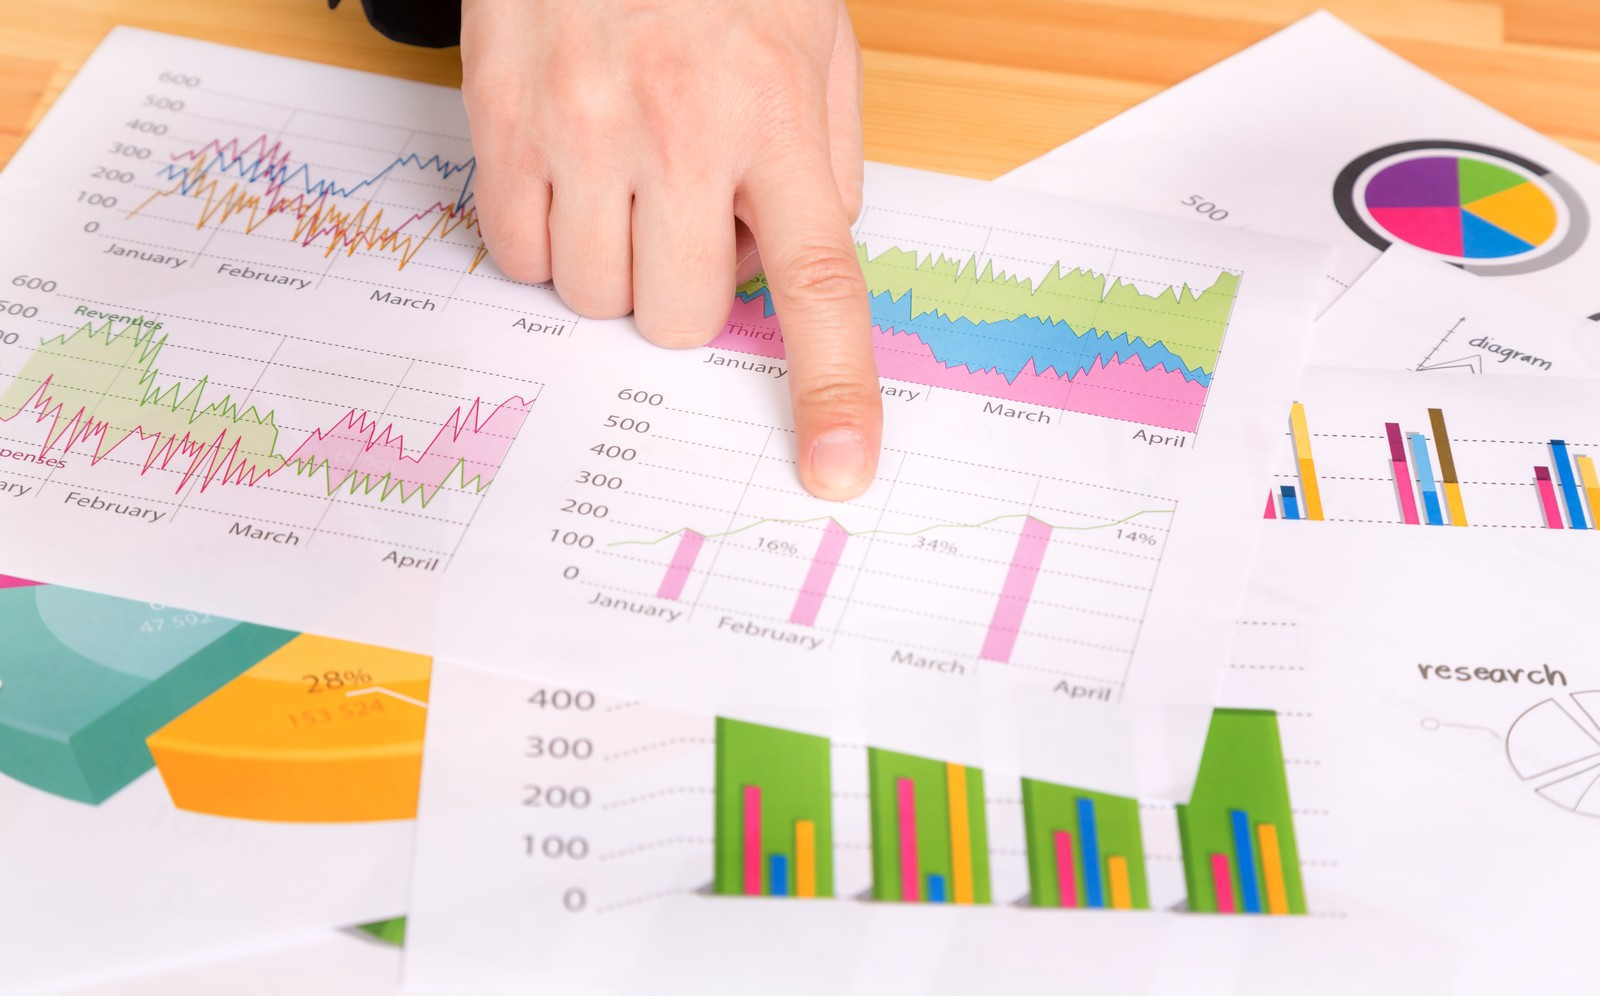 Excelで複合グラフを作成して情報を見やすくしよう